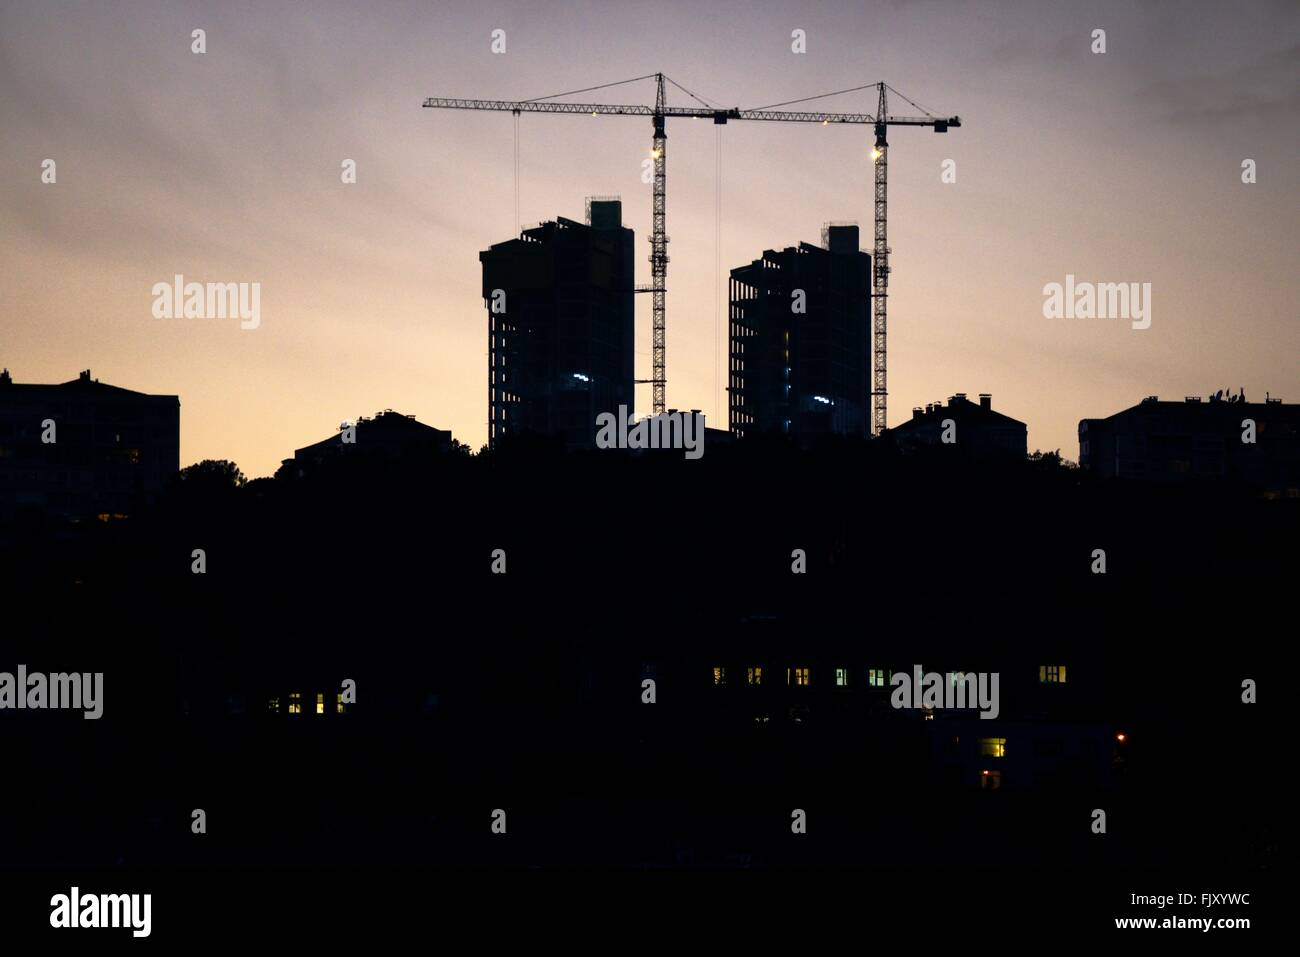 Apartment office blocks under construction rise above the Bosphorus near the Rumelihisari Castle. Sariyer, Istanbul, - Stock Image